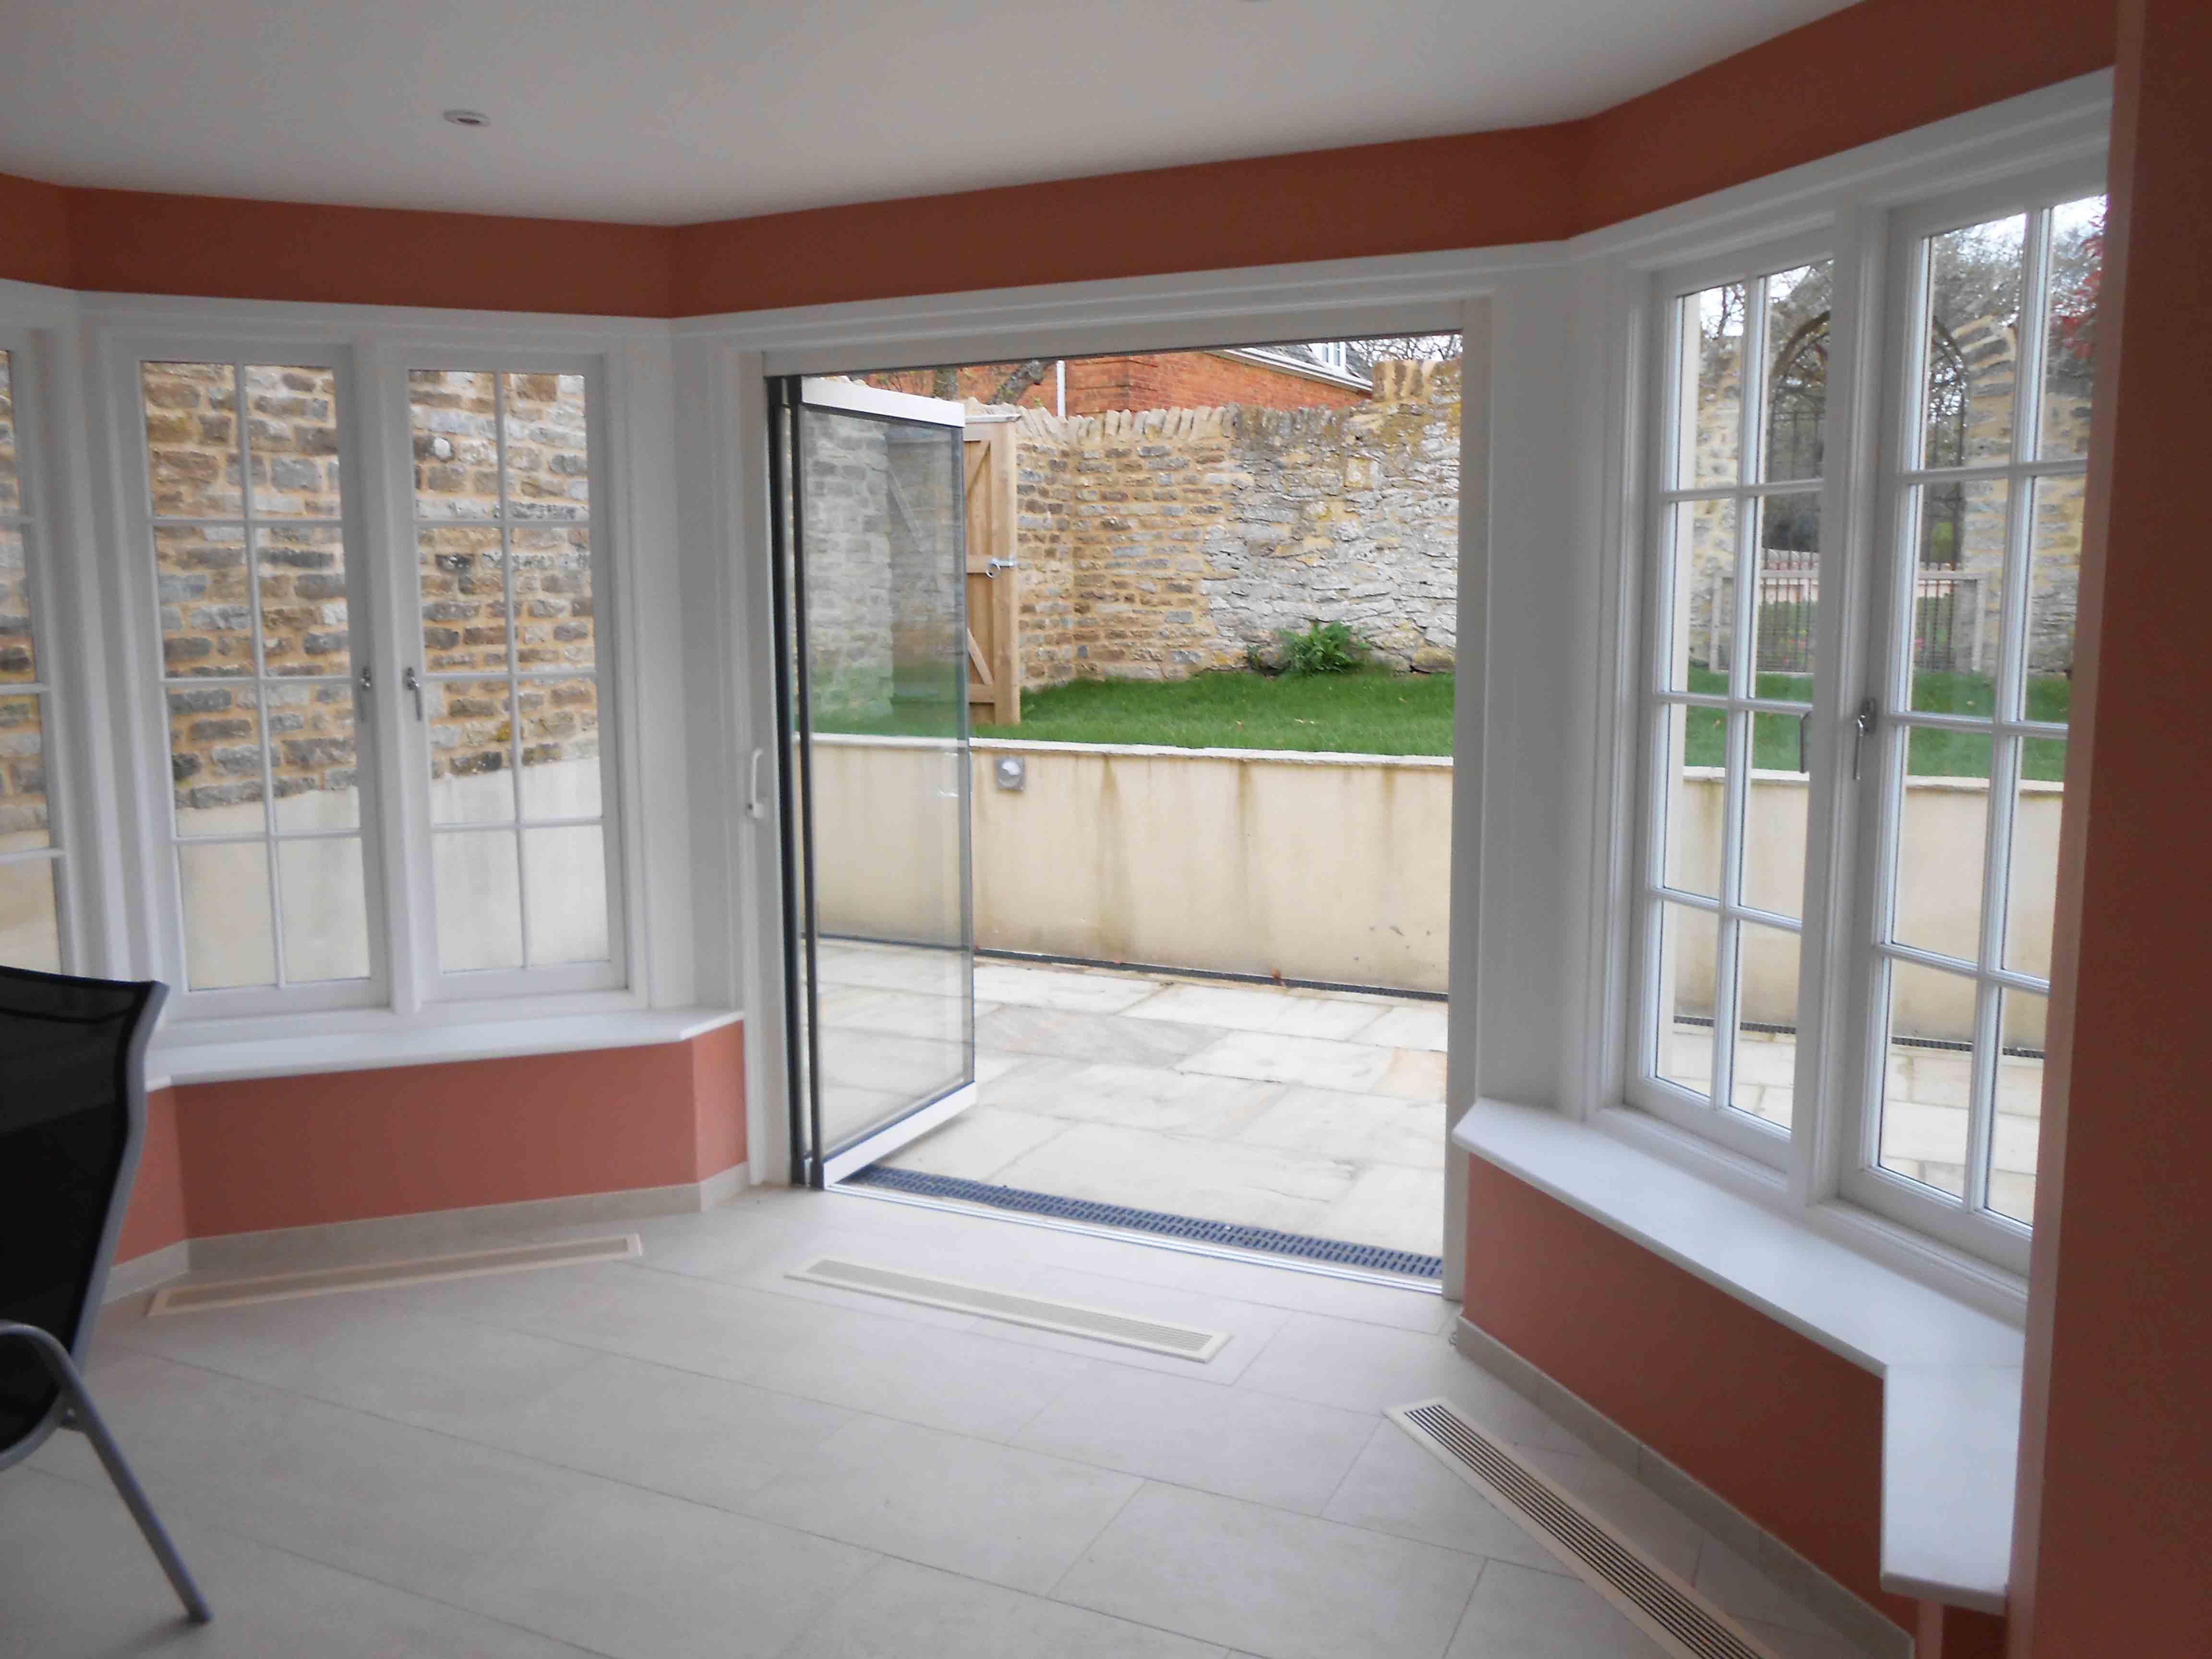 Internal glass room iders archives frameless glass bi fold doors - Larger And Better Views With Frameless Bifolding Doors